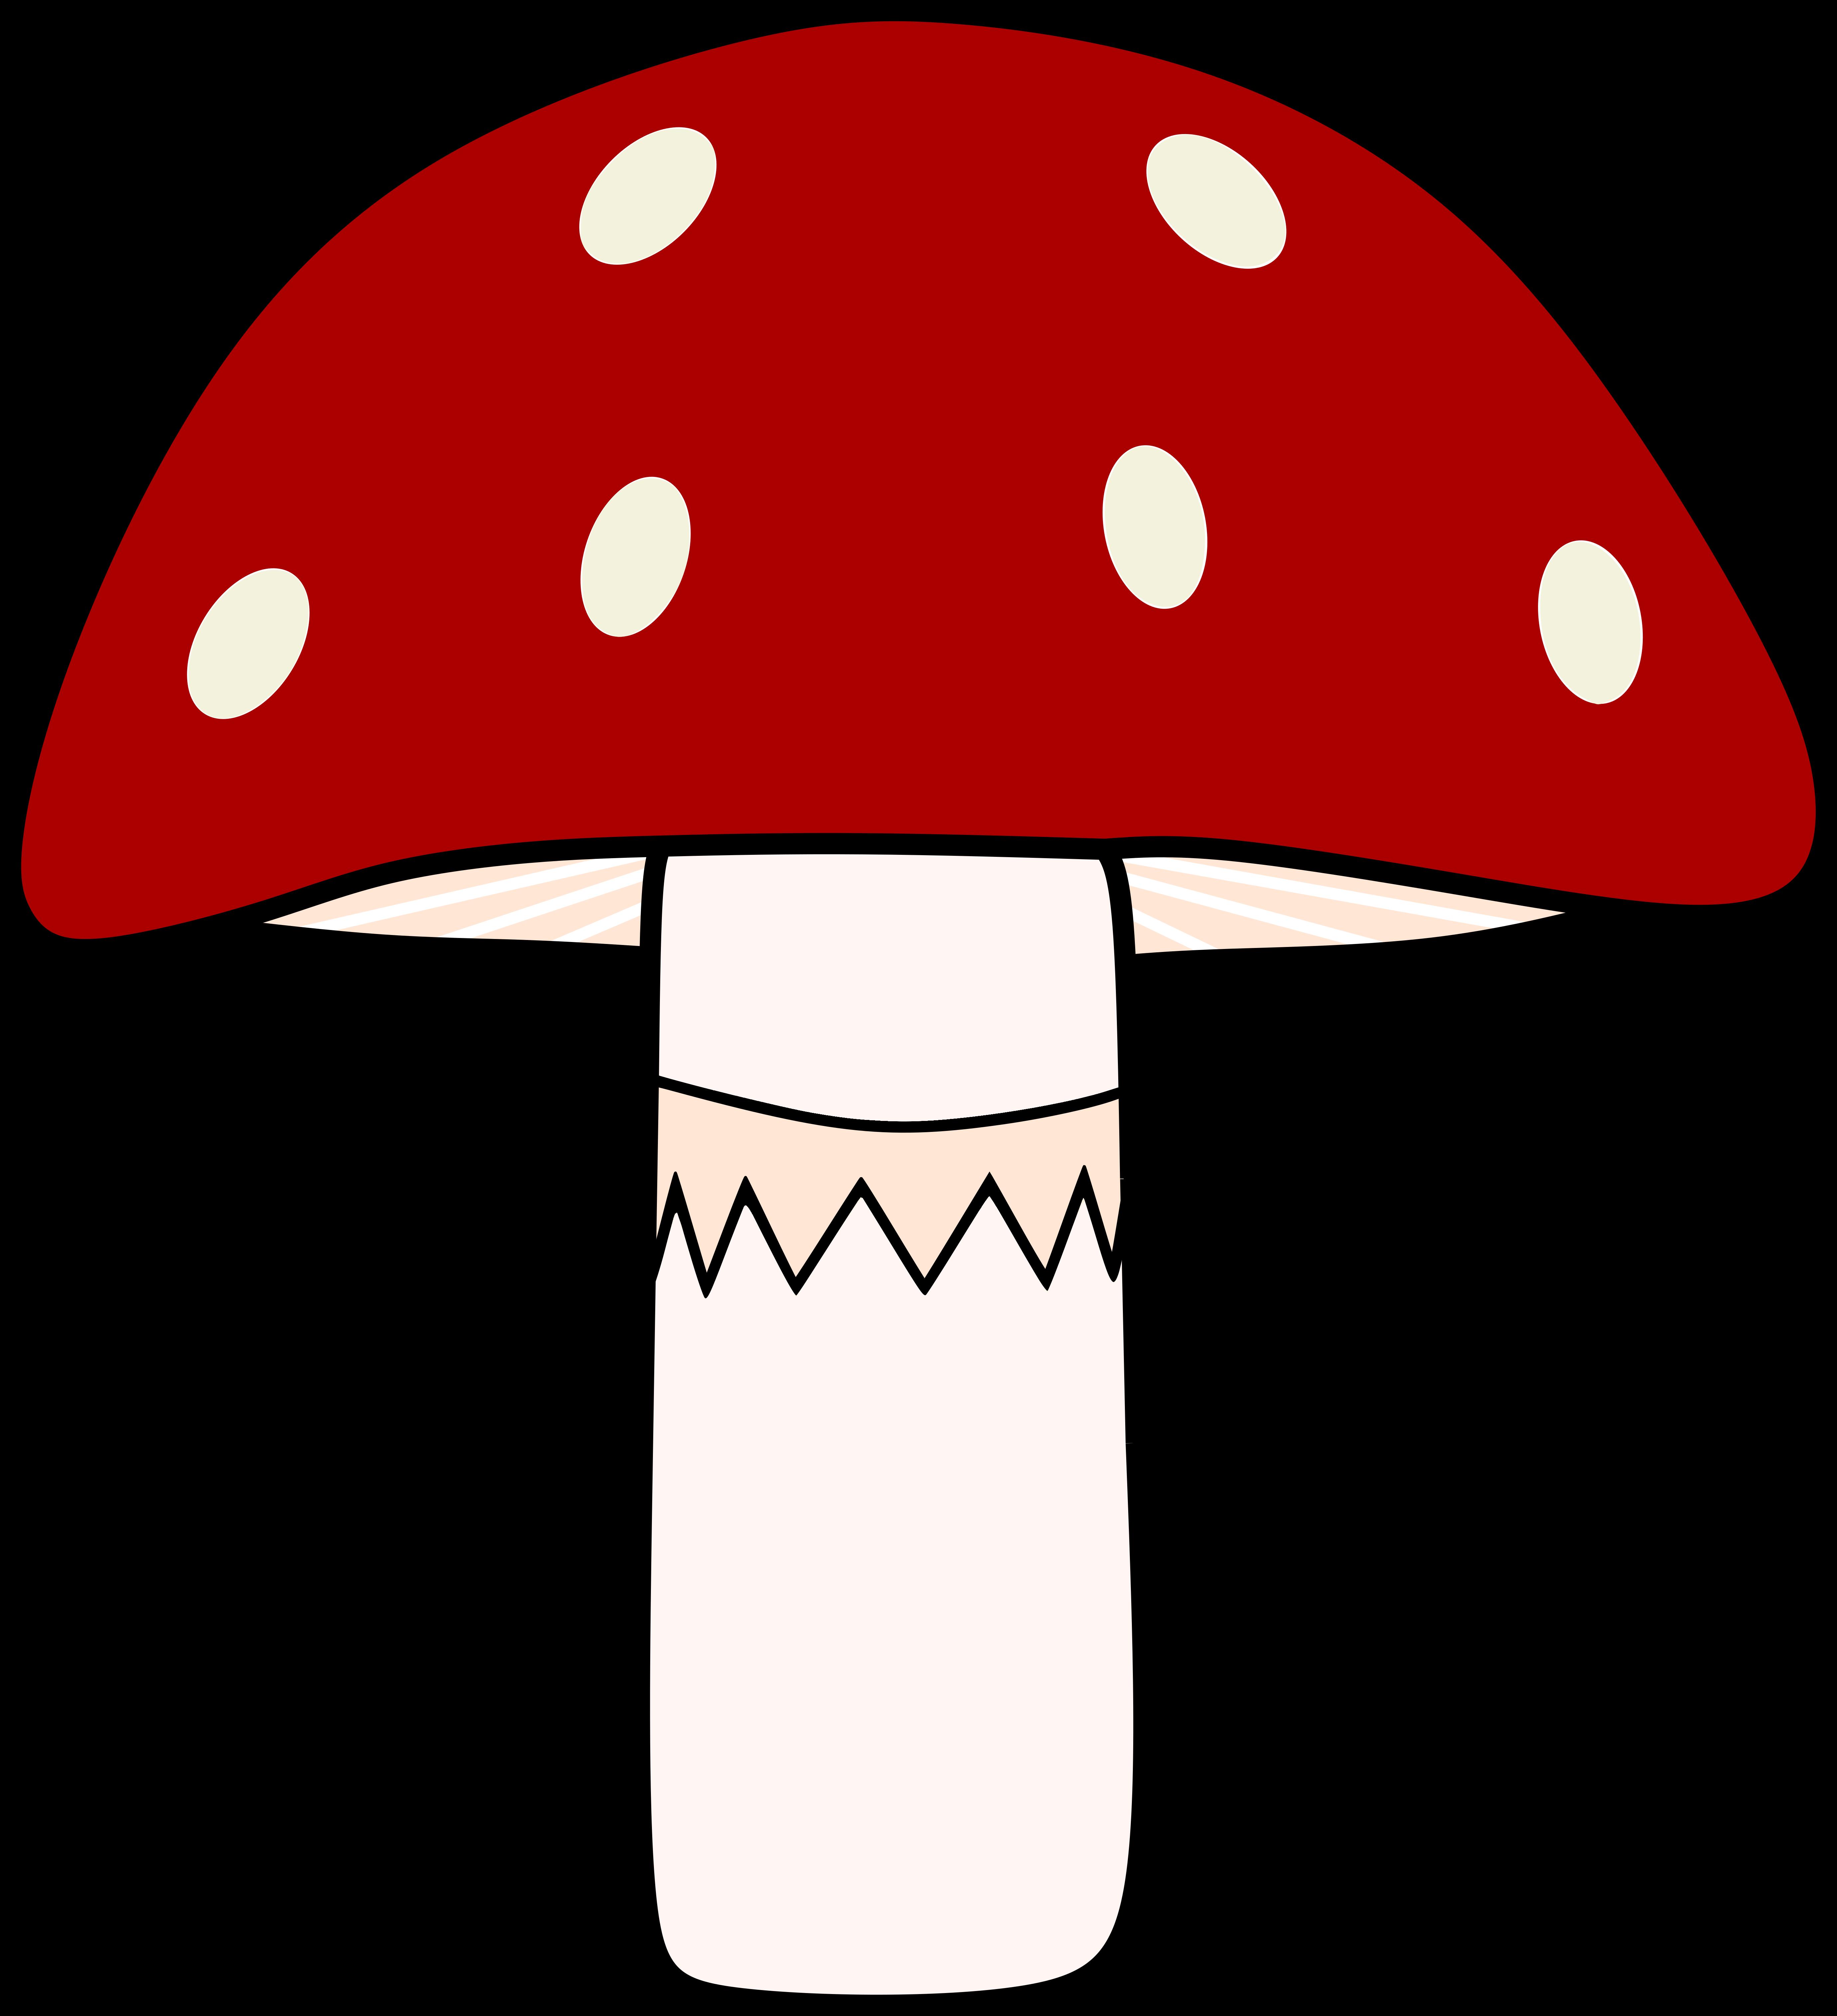 Gratis Obraz Na Pixabay Grzyb Muchomor Czerwony Painting Drawing Painting Graphic